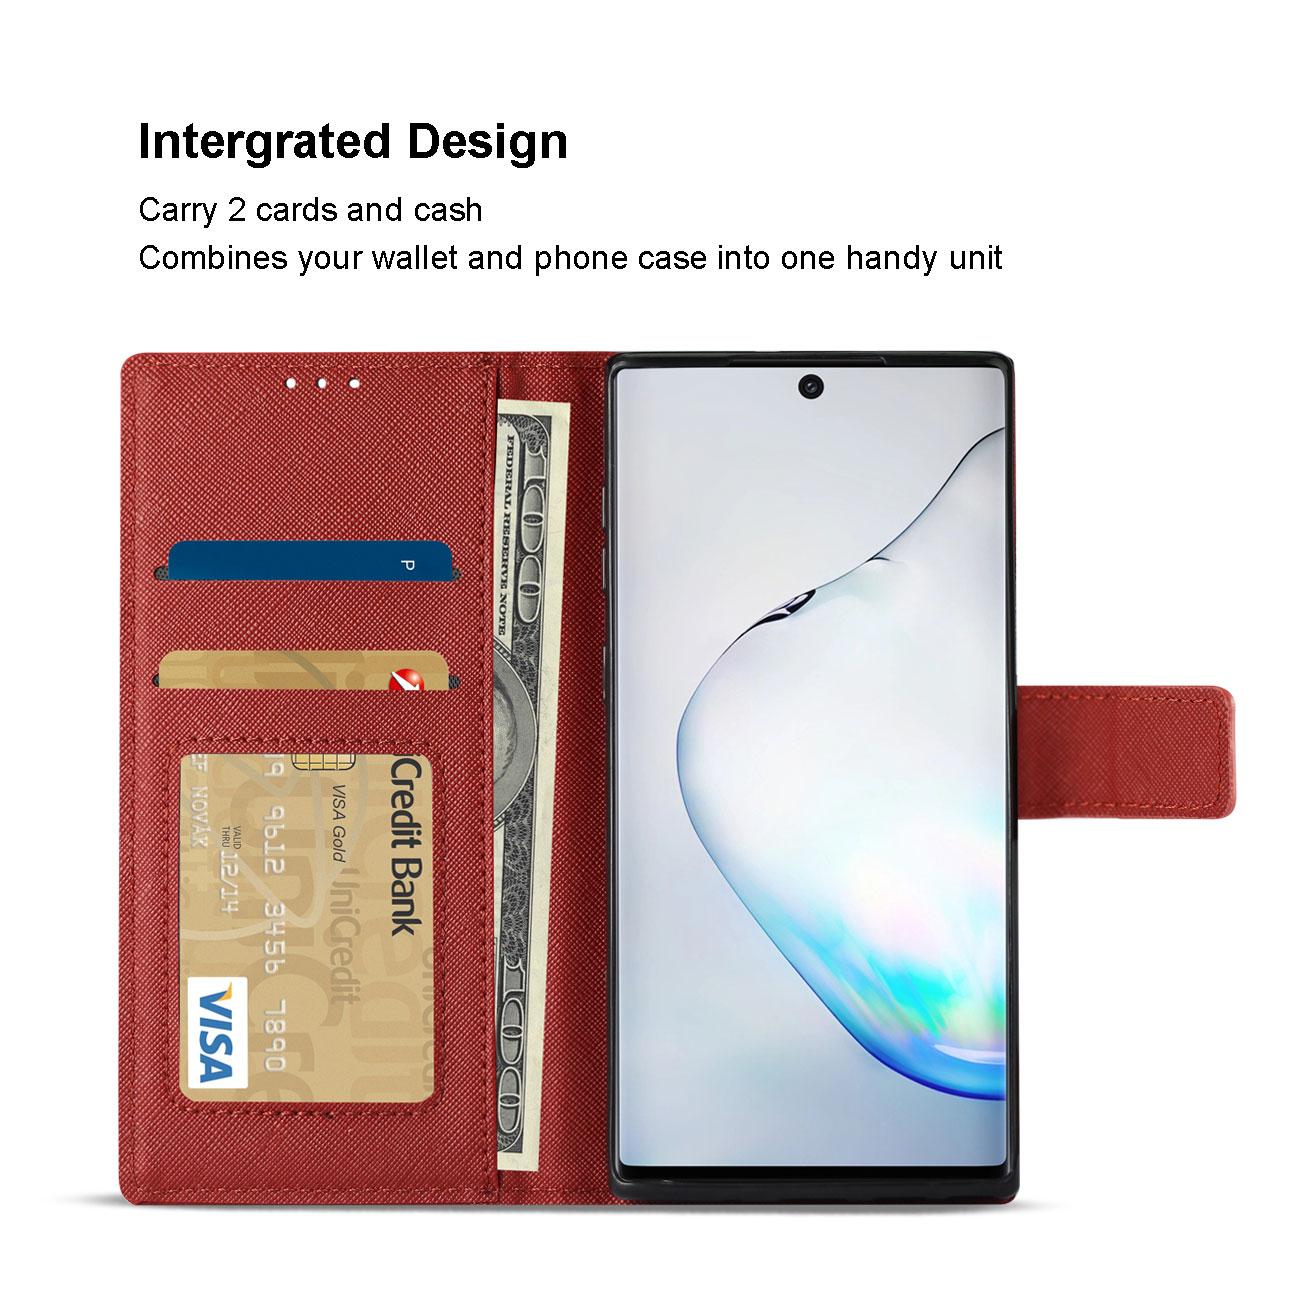 SAMSUNG GALAXY NOTE 10 3-In-1 Wallet Case In RED